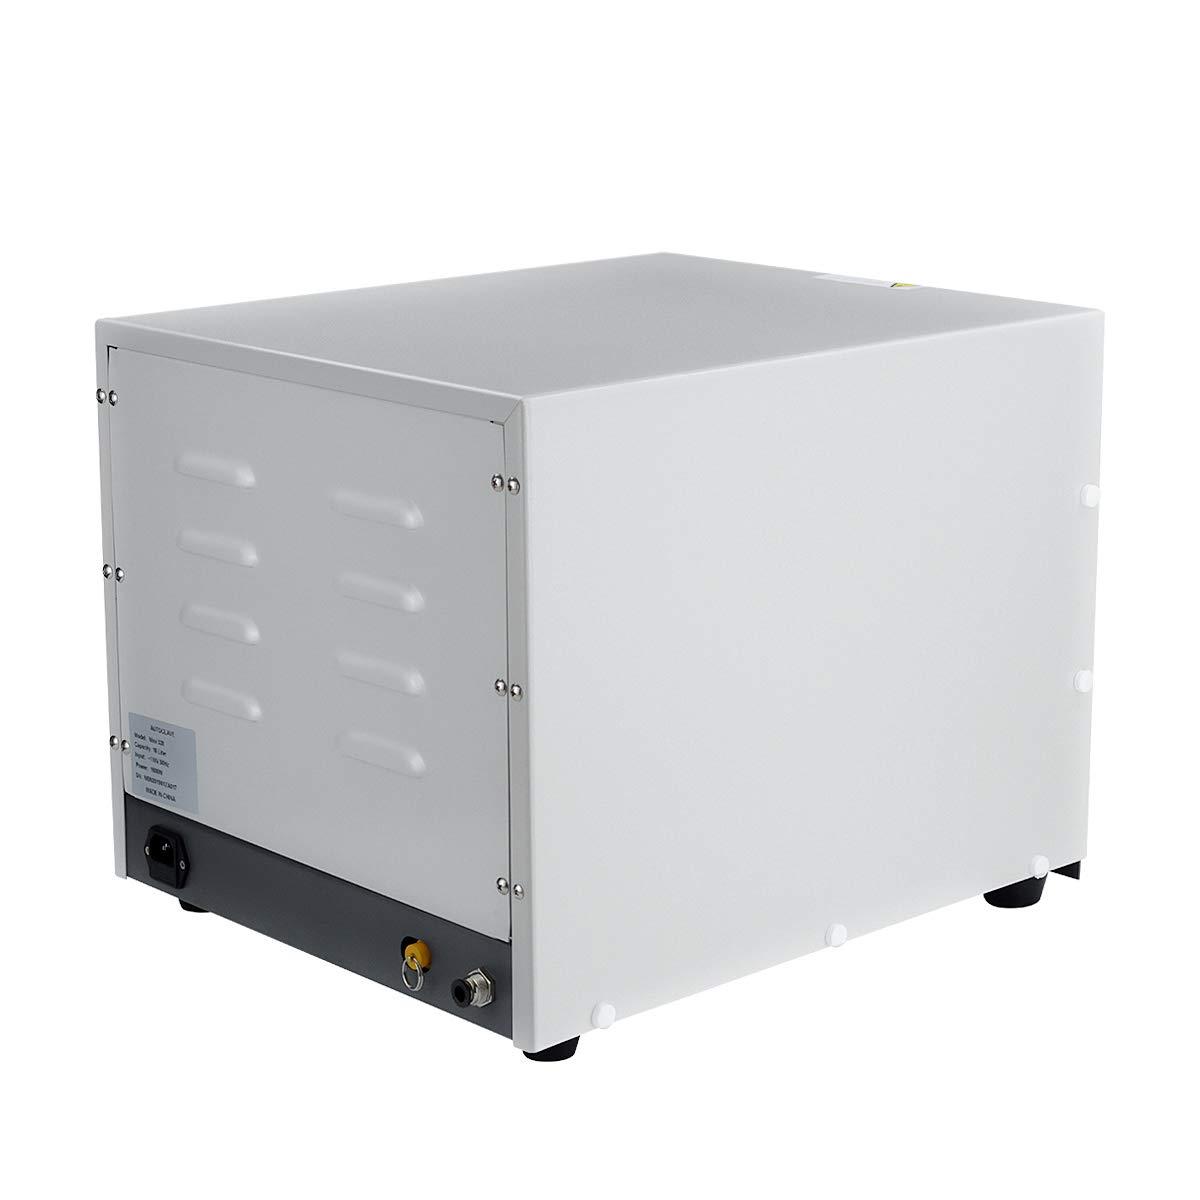 SOHOME 18L MINI320 Digital Display Autoclave Steam Lab Machine by SoHome (Image #10)